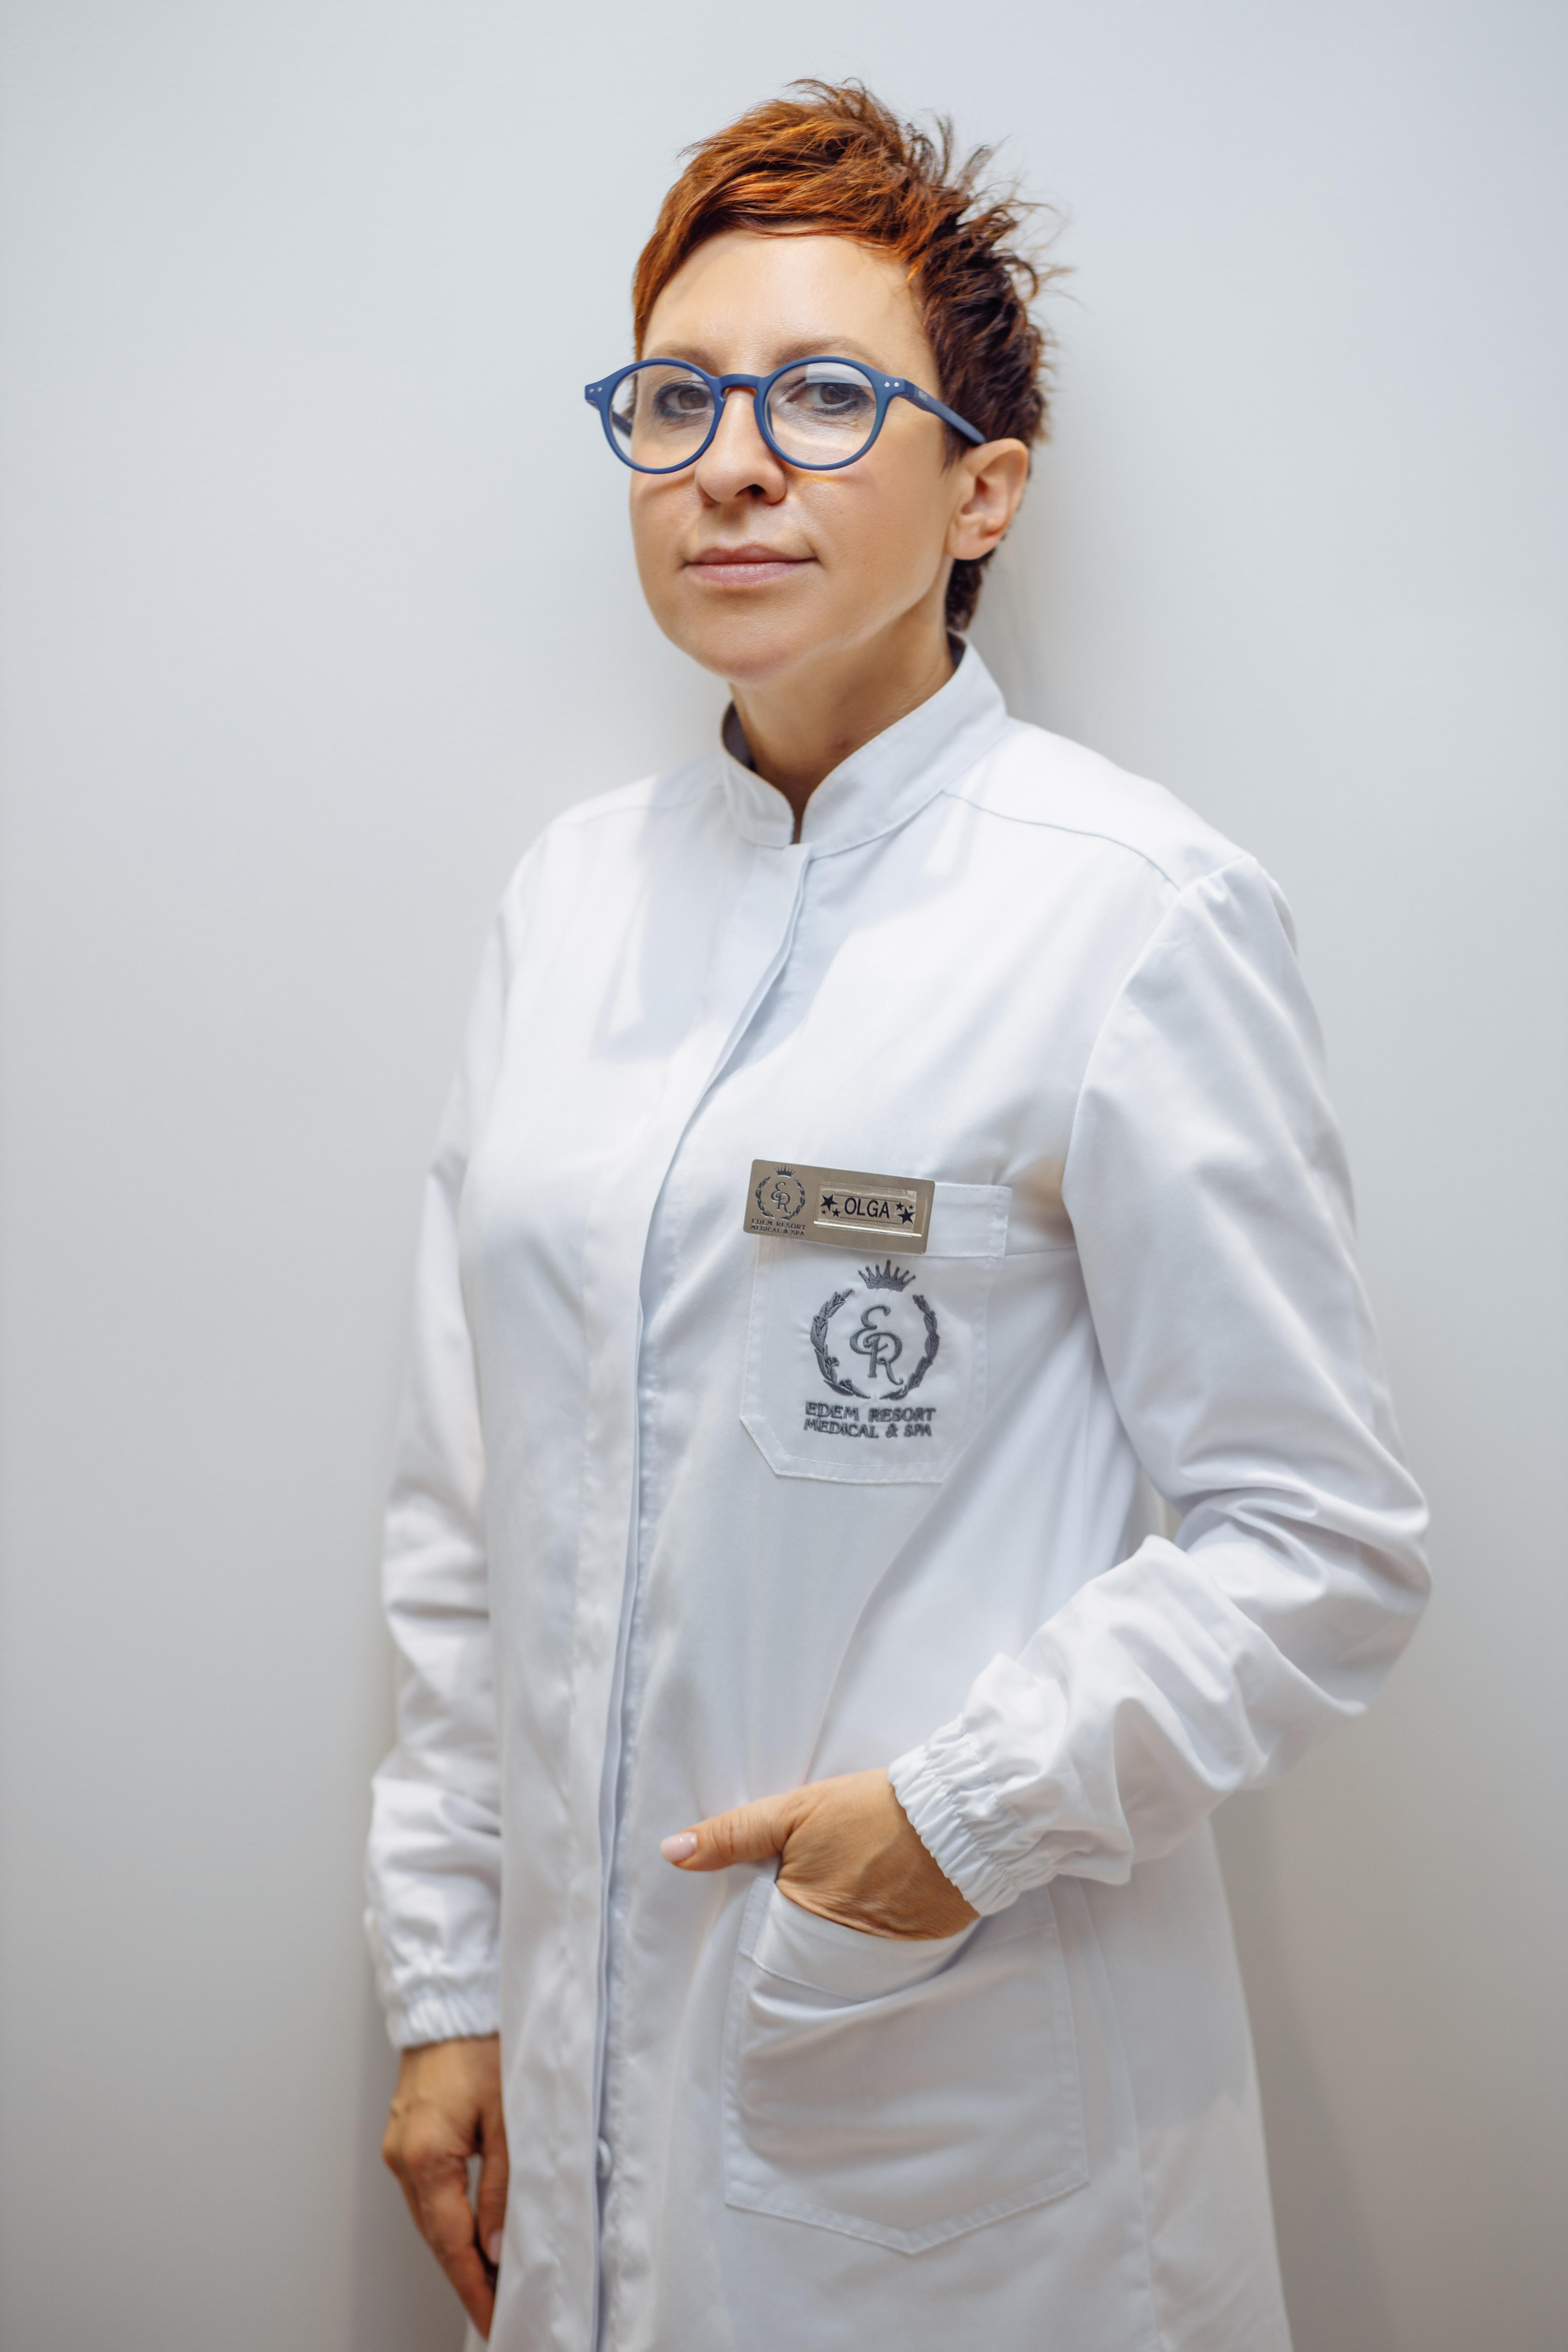 Ольга Полак, керівник відділу естетичної медицини Edem Resort Medical & SPA